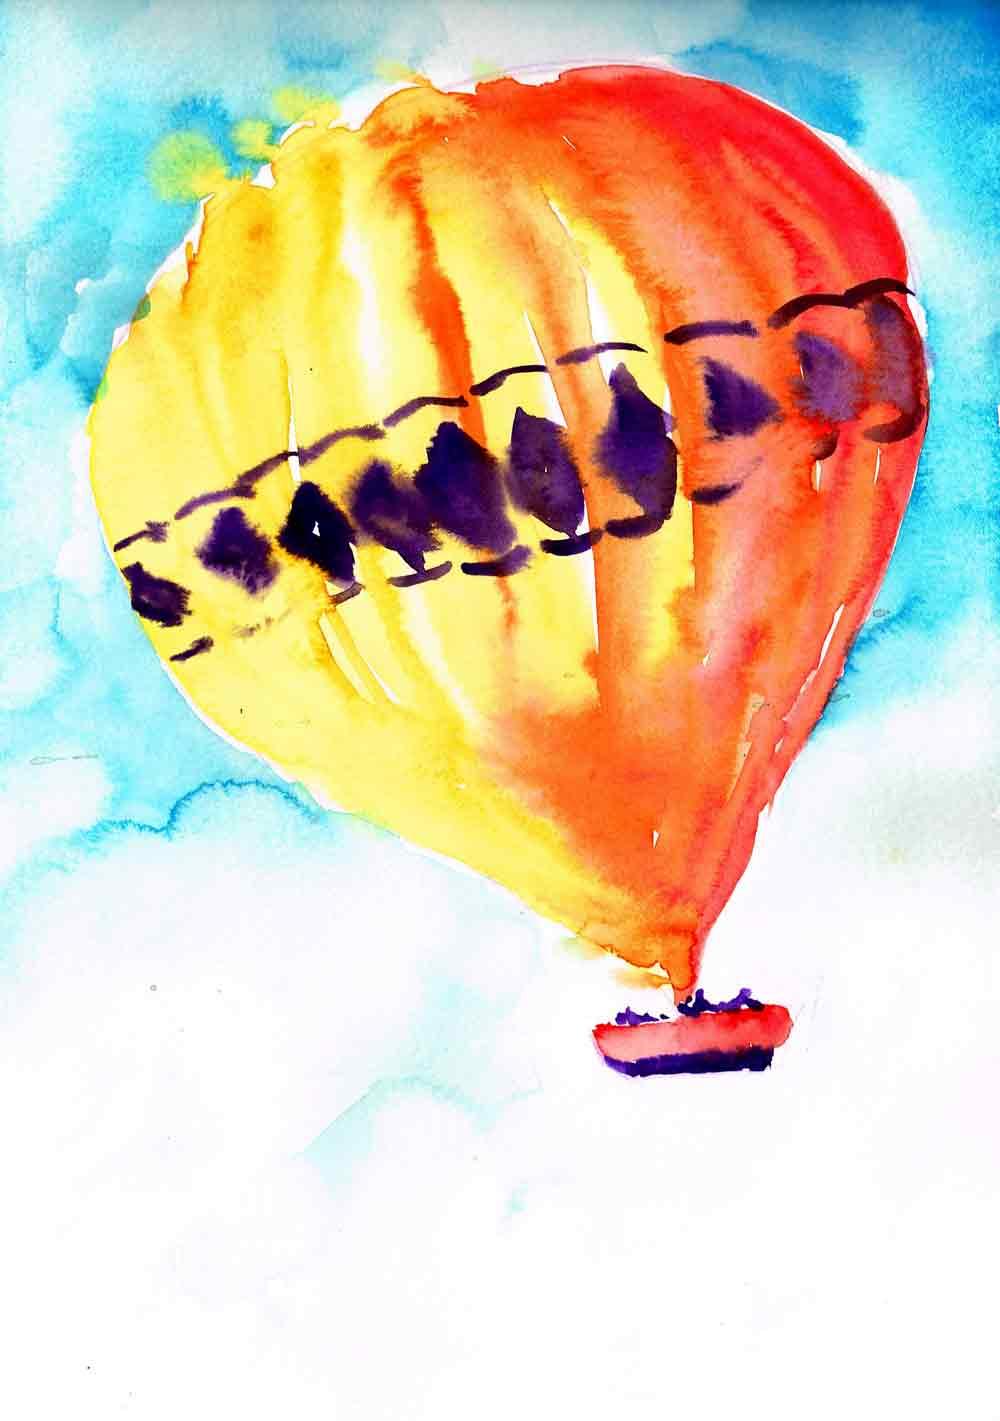 Jan 19 Hot Air Balloons II